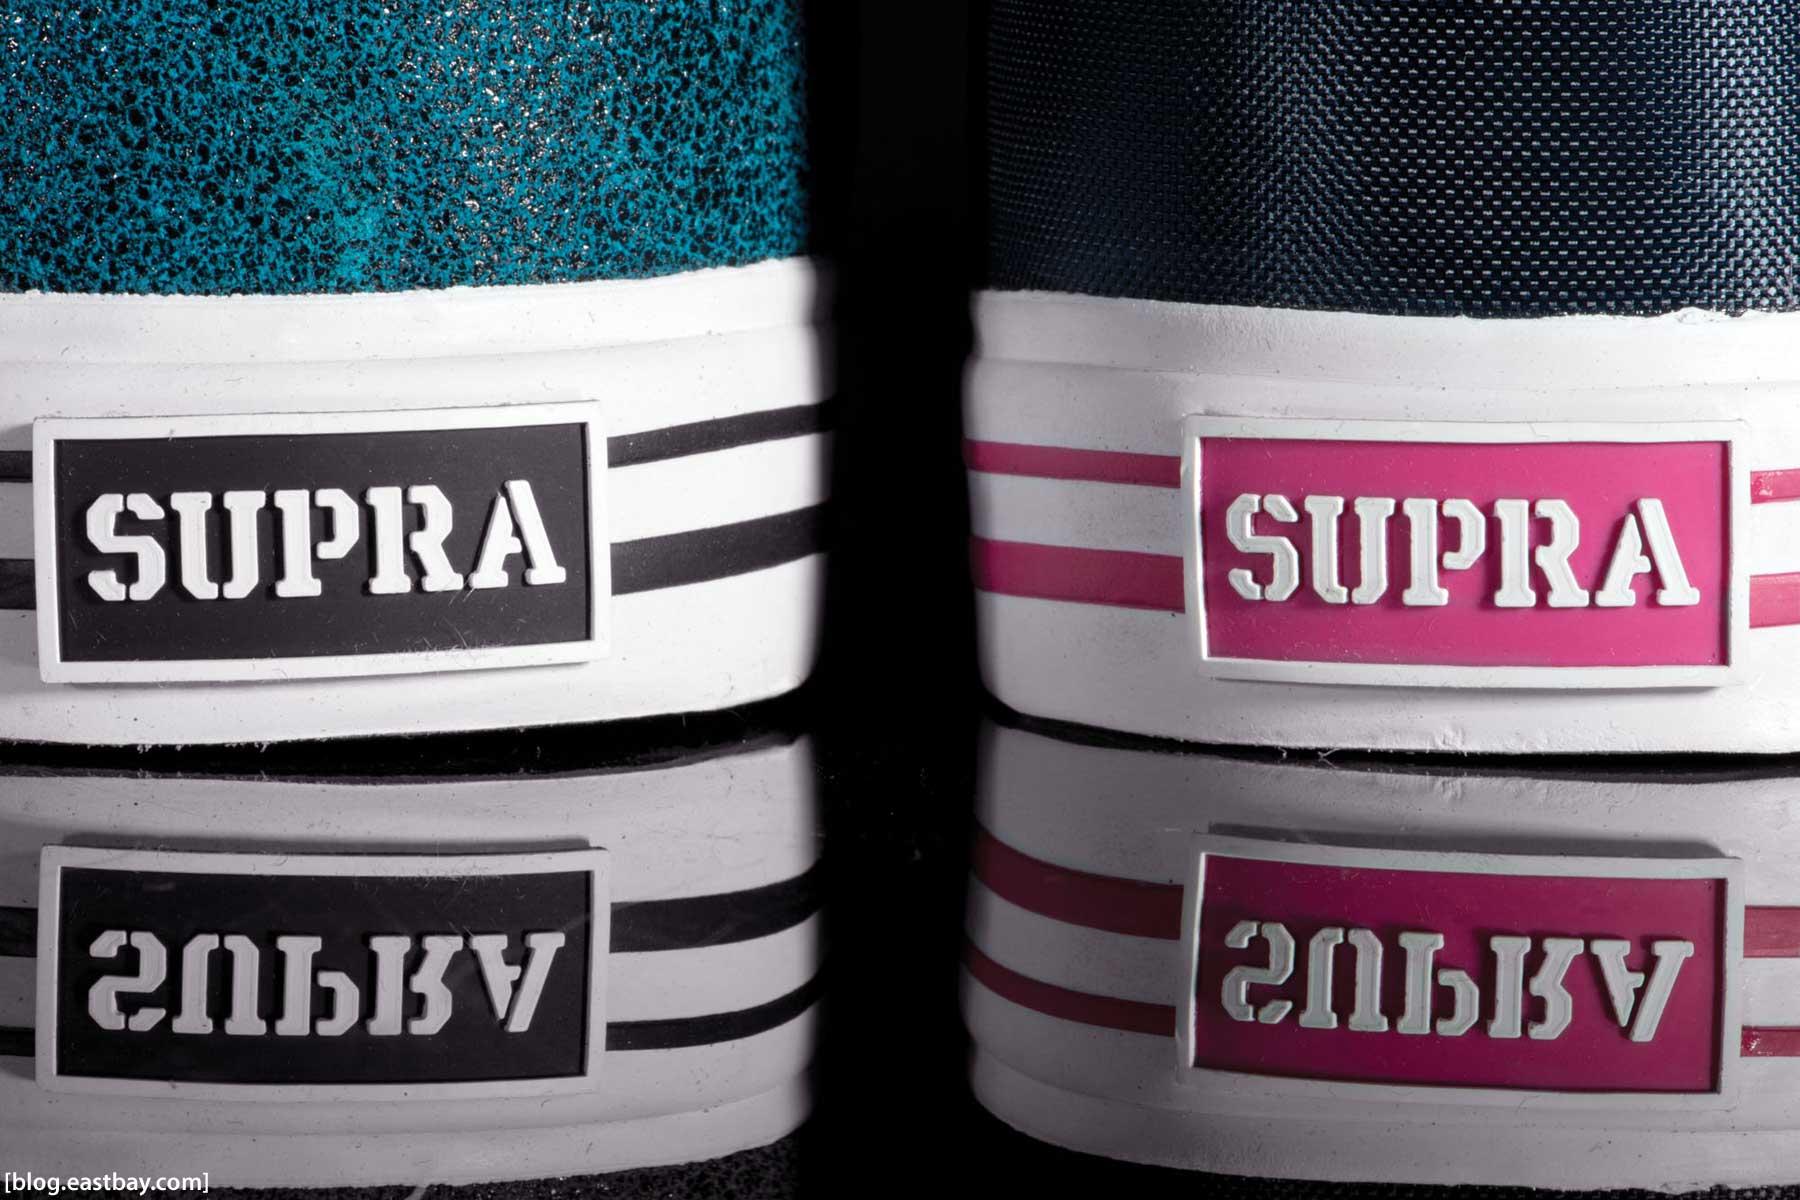 Wallpaper Under Every Supra Footwear Design Eastbay Blog 1800x1200